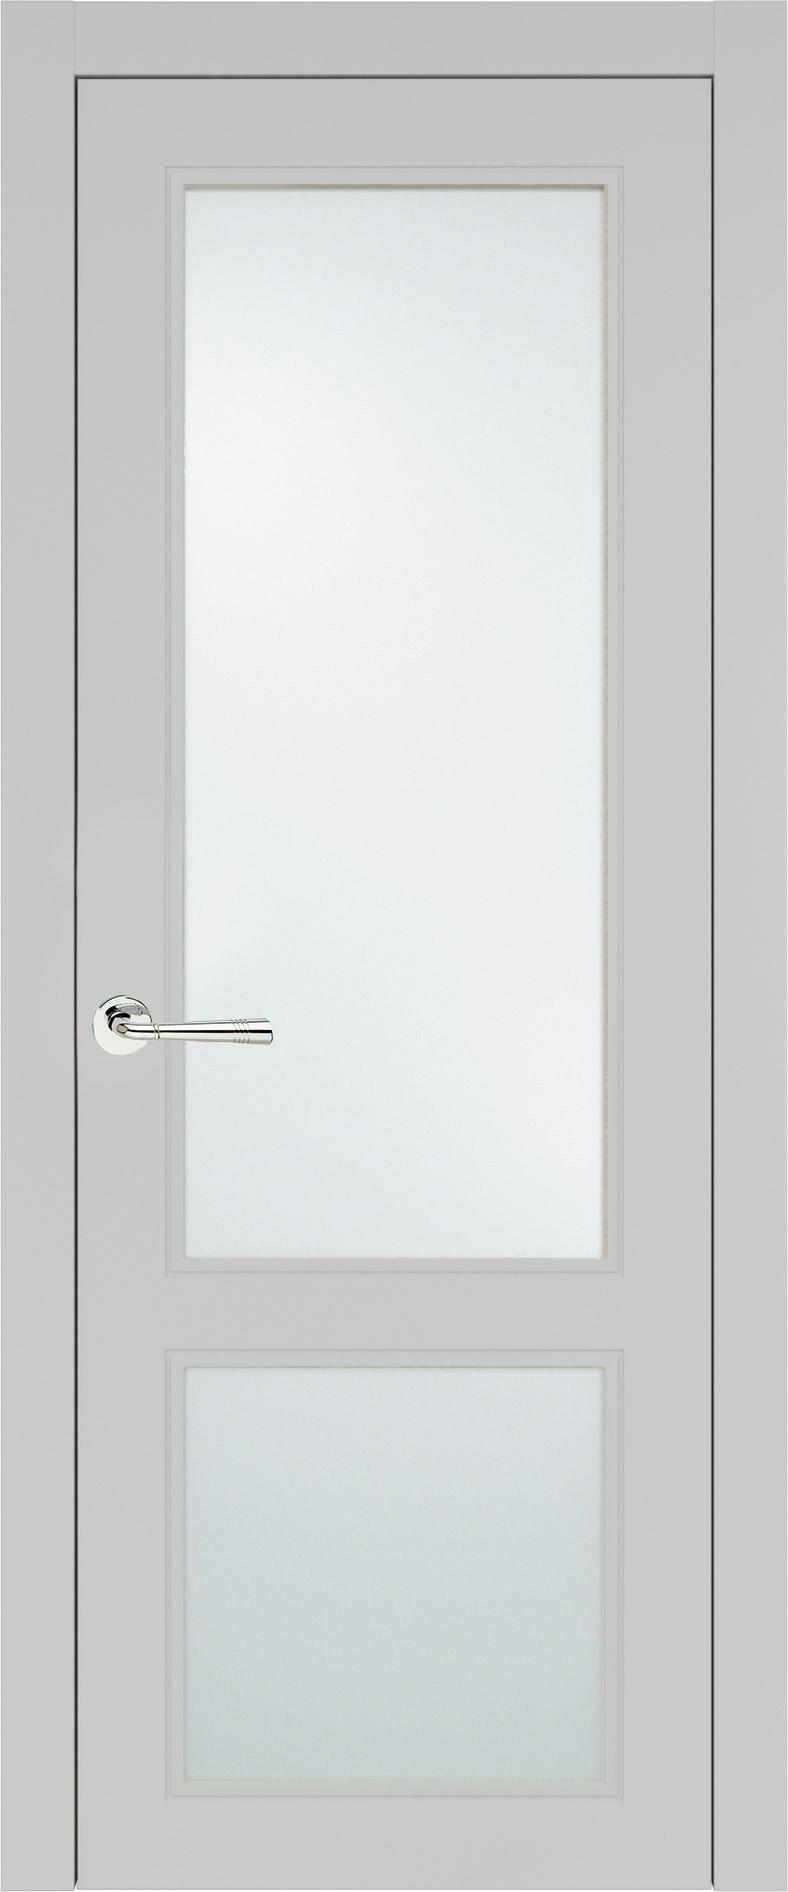 Dinastia Neo Classic цвет - Серая эмаль (RAL 7047) Со стеклом (ДО)